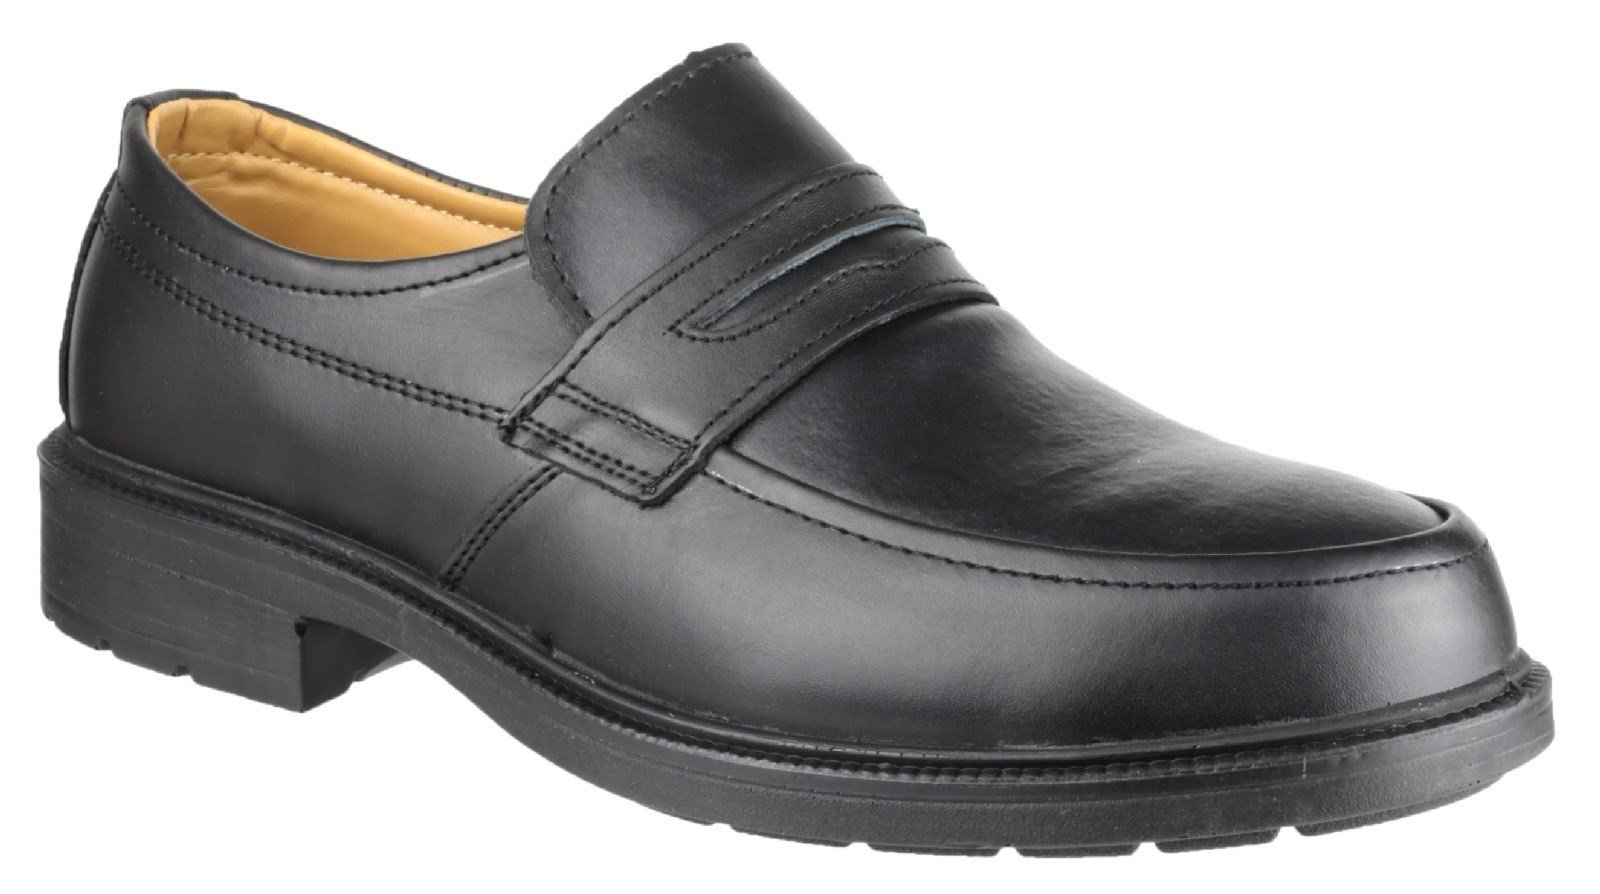 Amblers Unisex Safety Mocc Toe S1P SRC Slip On Shoe Black 25278 - Black 6